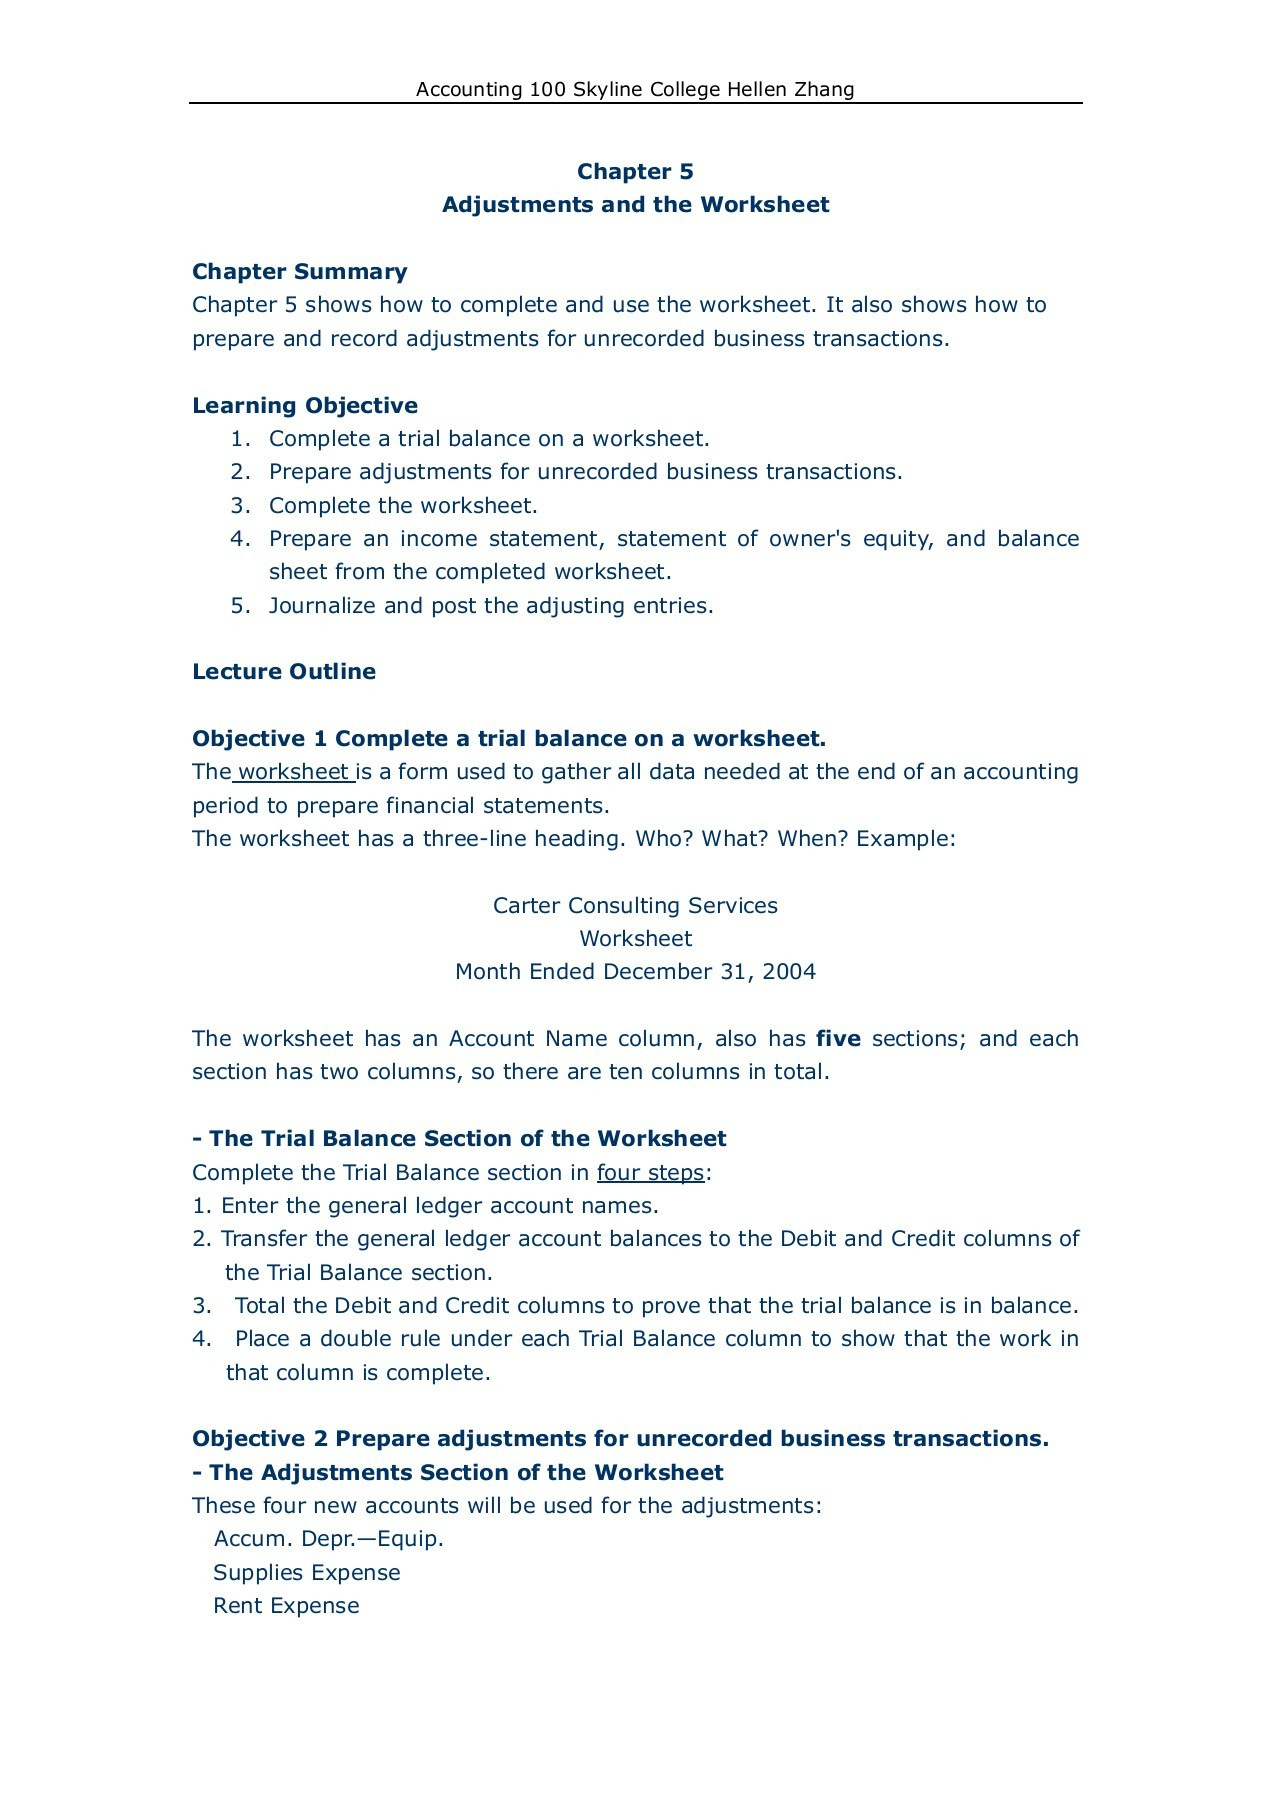 Accounting Transaction Worksheet Example